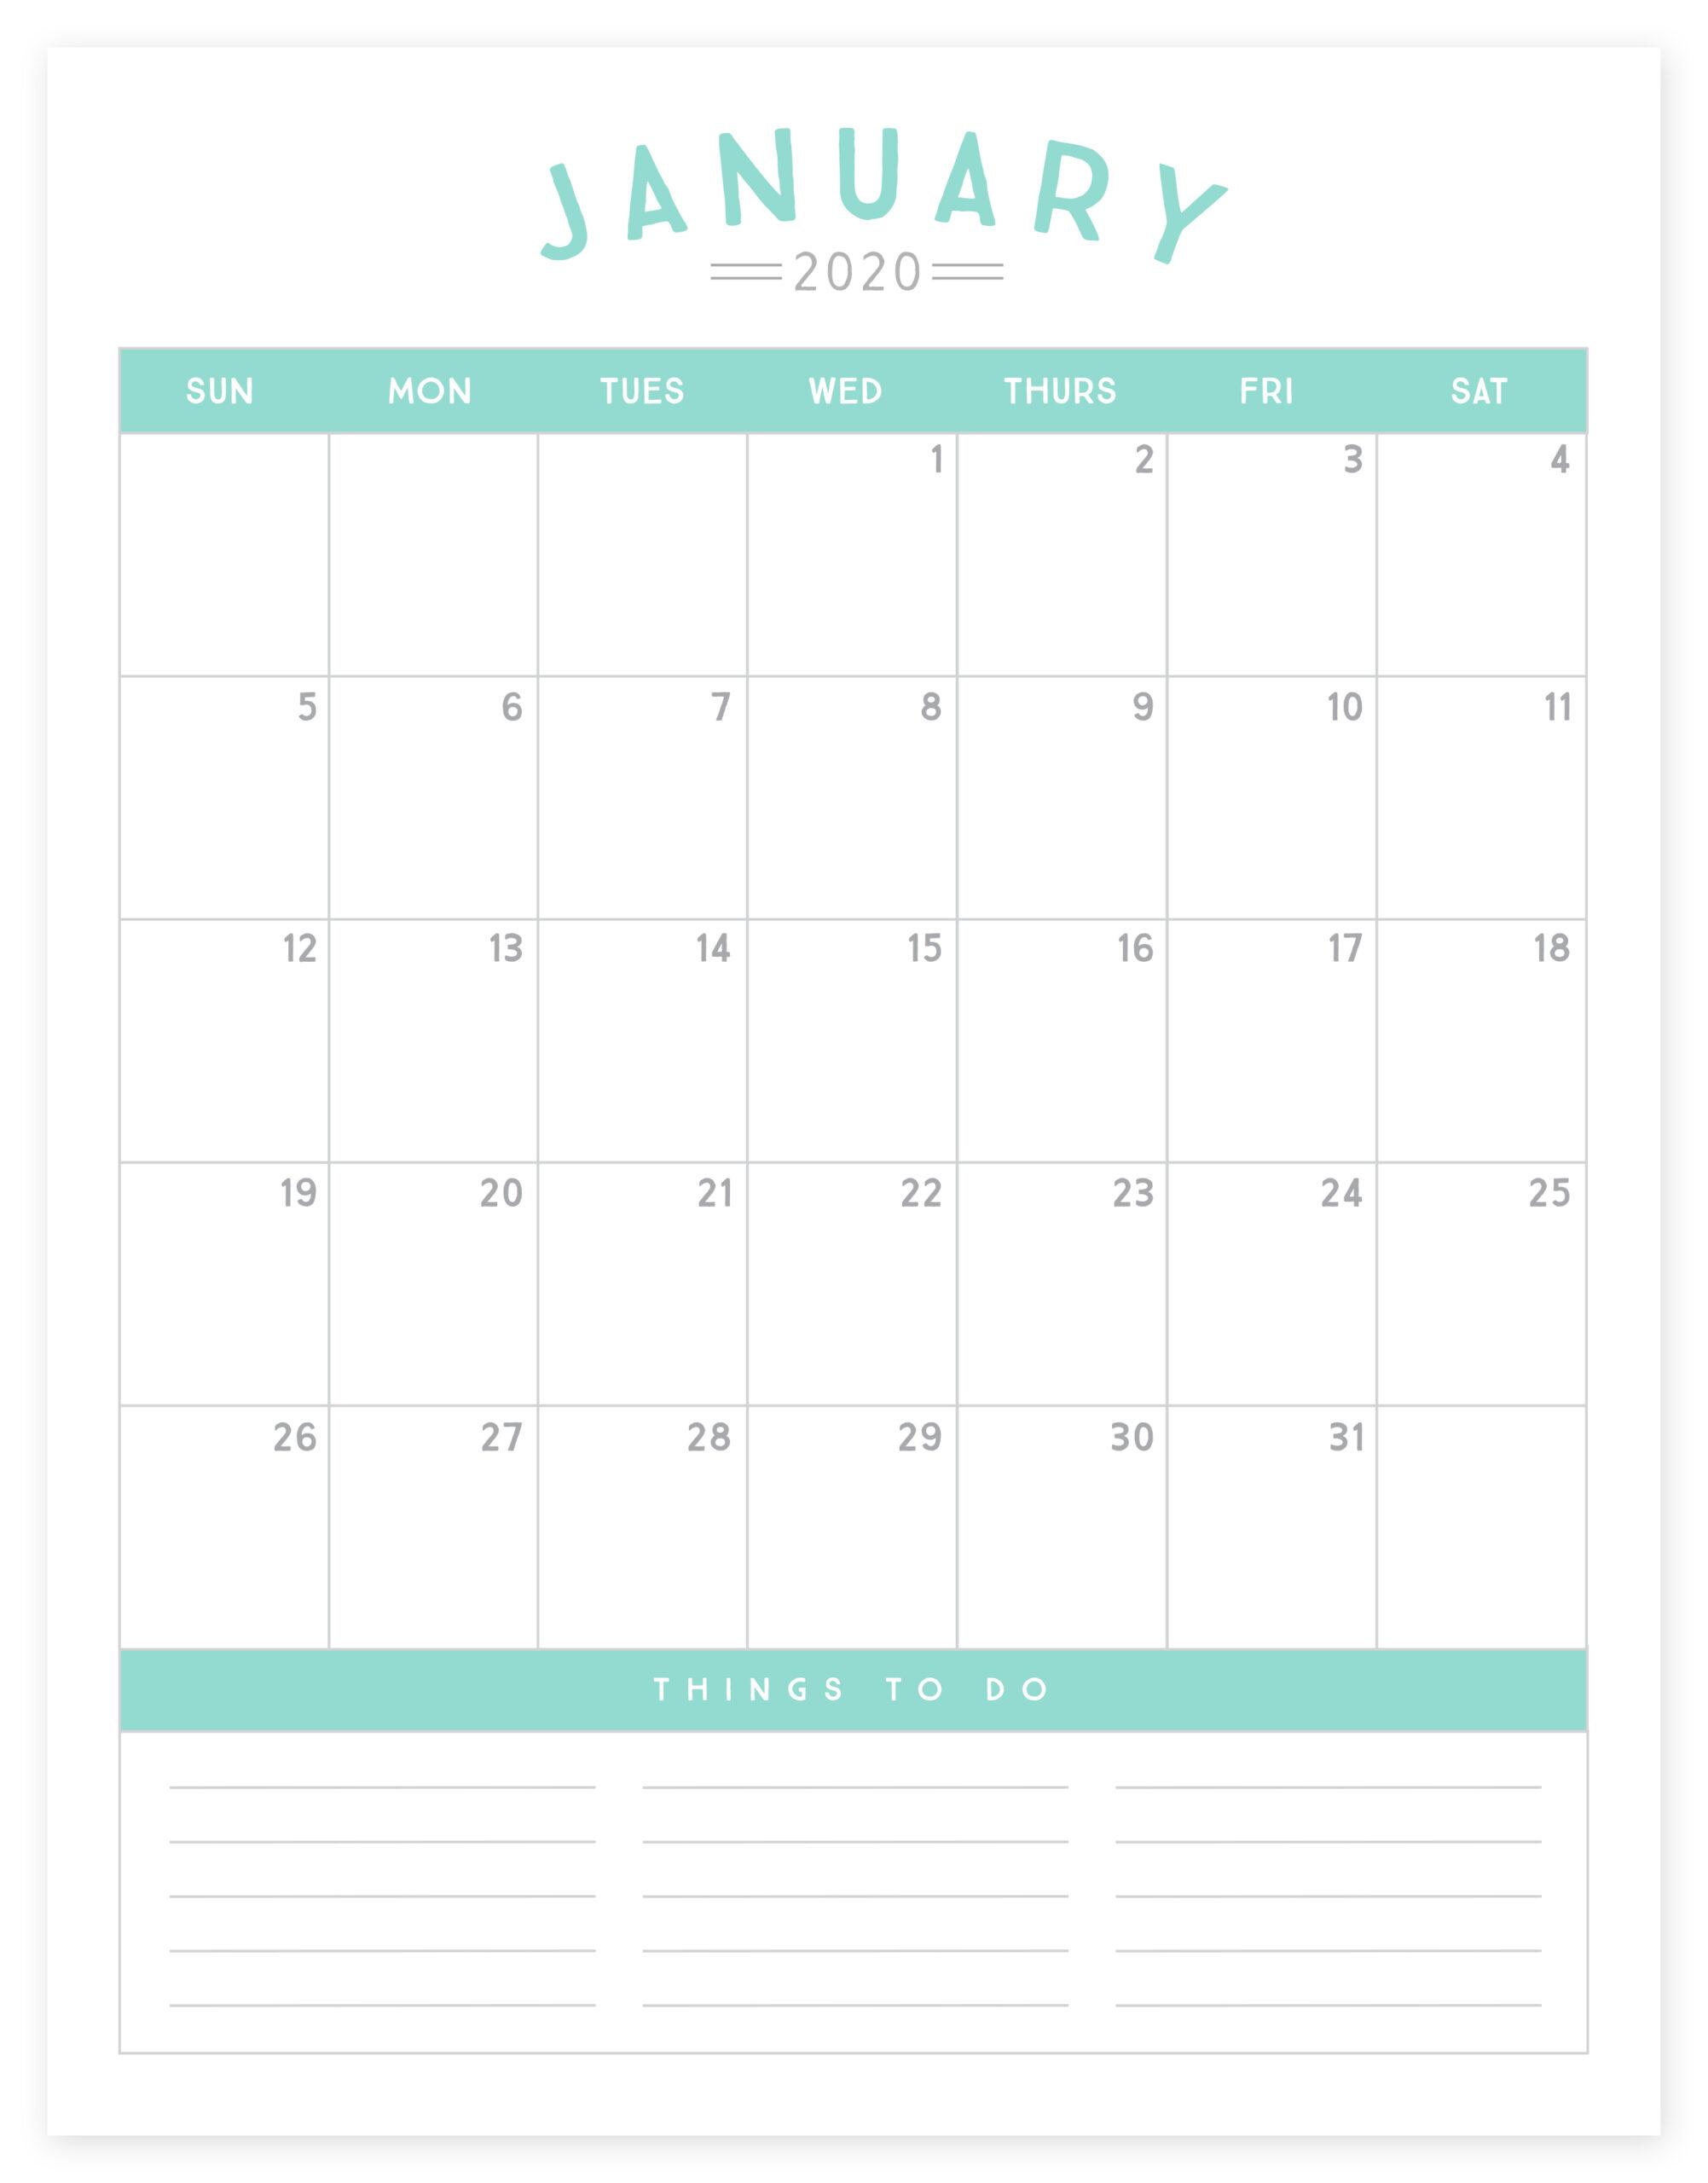 2020 Calendar Simple As That - Simple As That